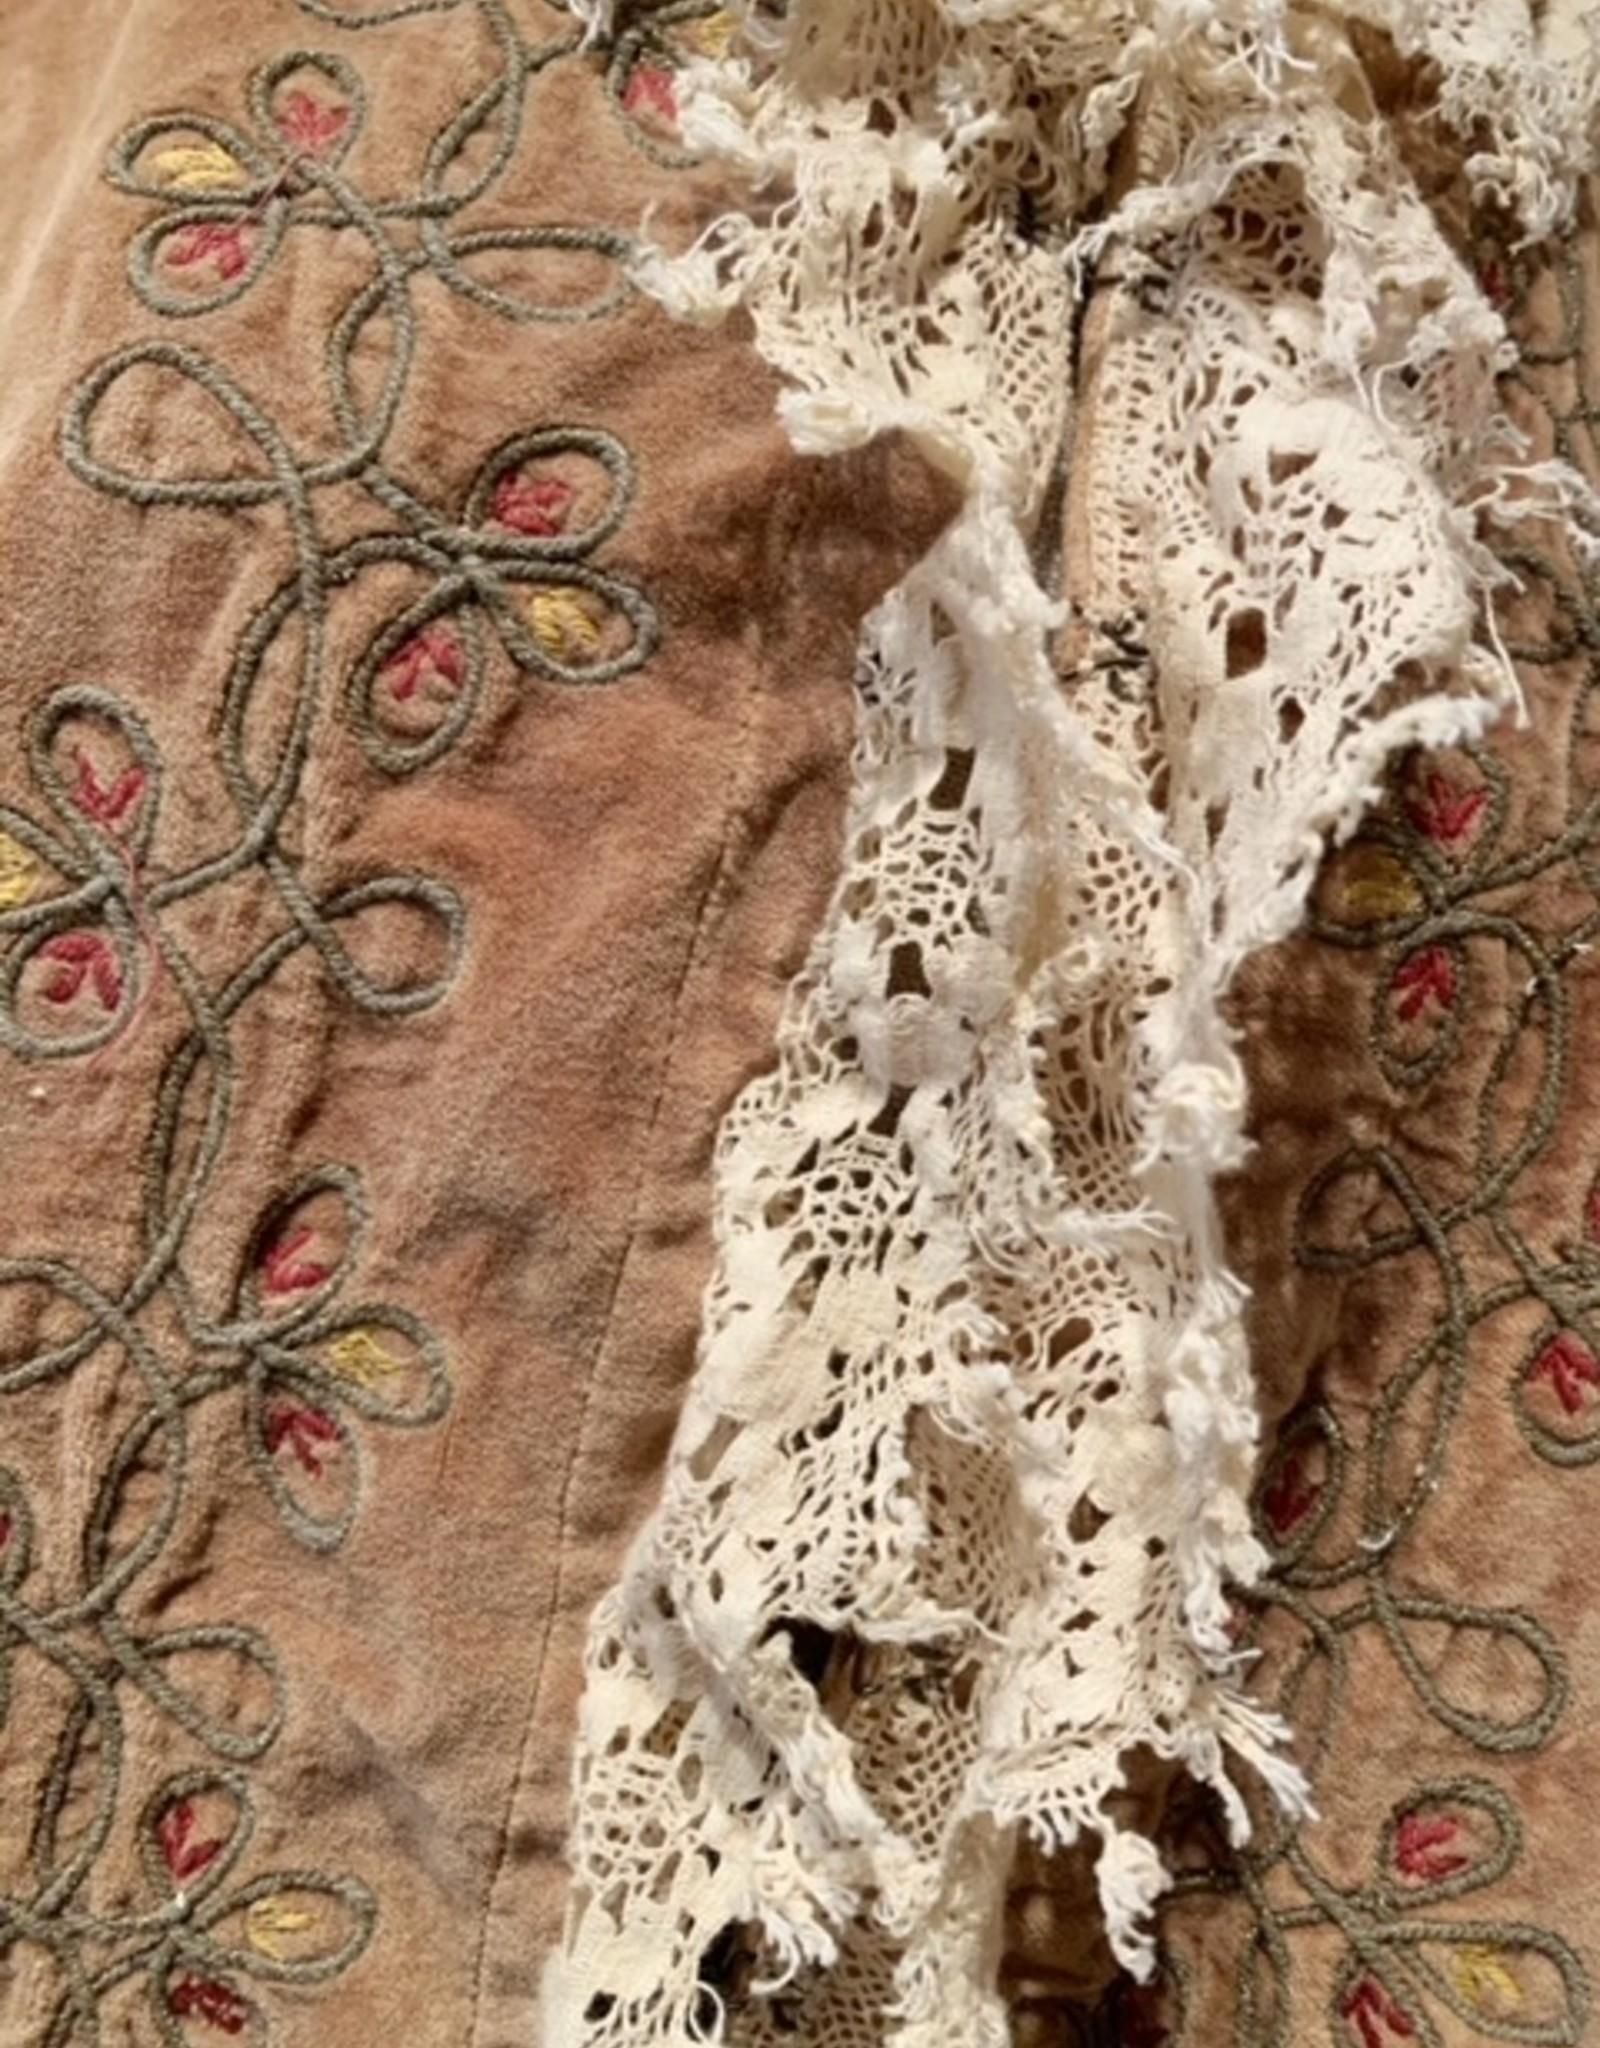 Magnolia Pearl jacket 458 one size